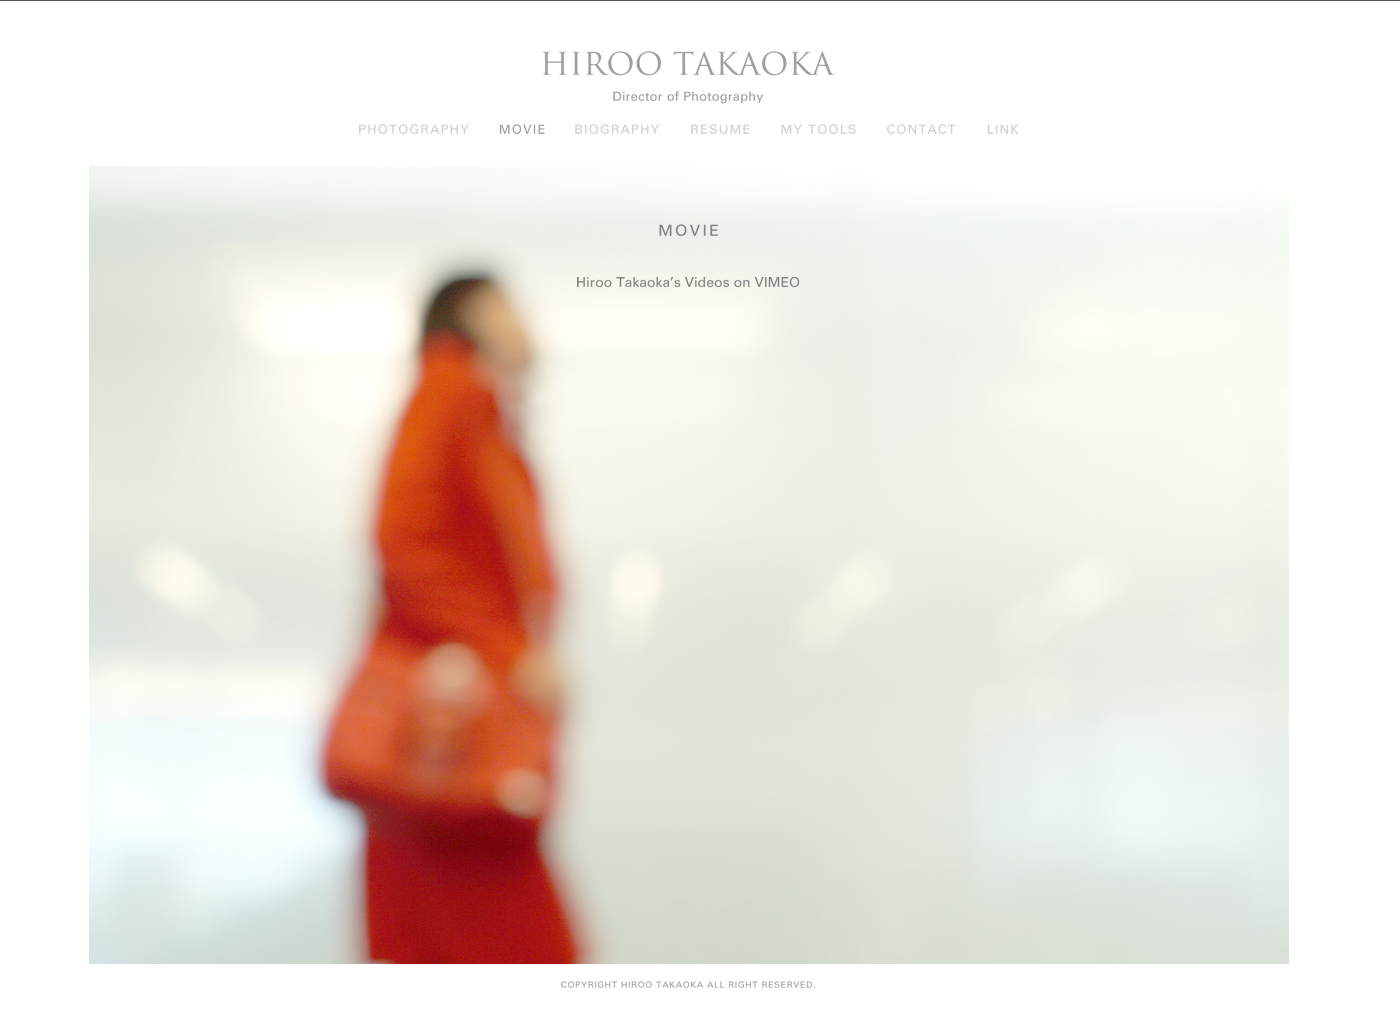 and_Design_HirooTakaoka_web_03.jpg